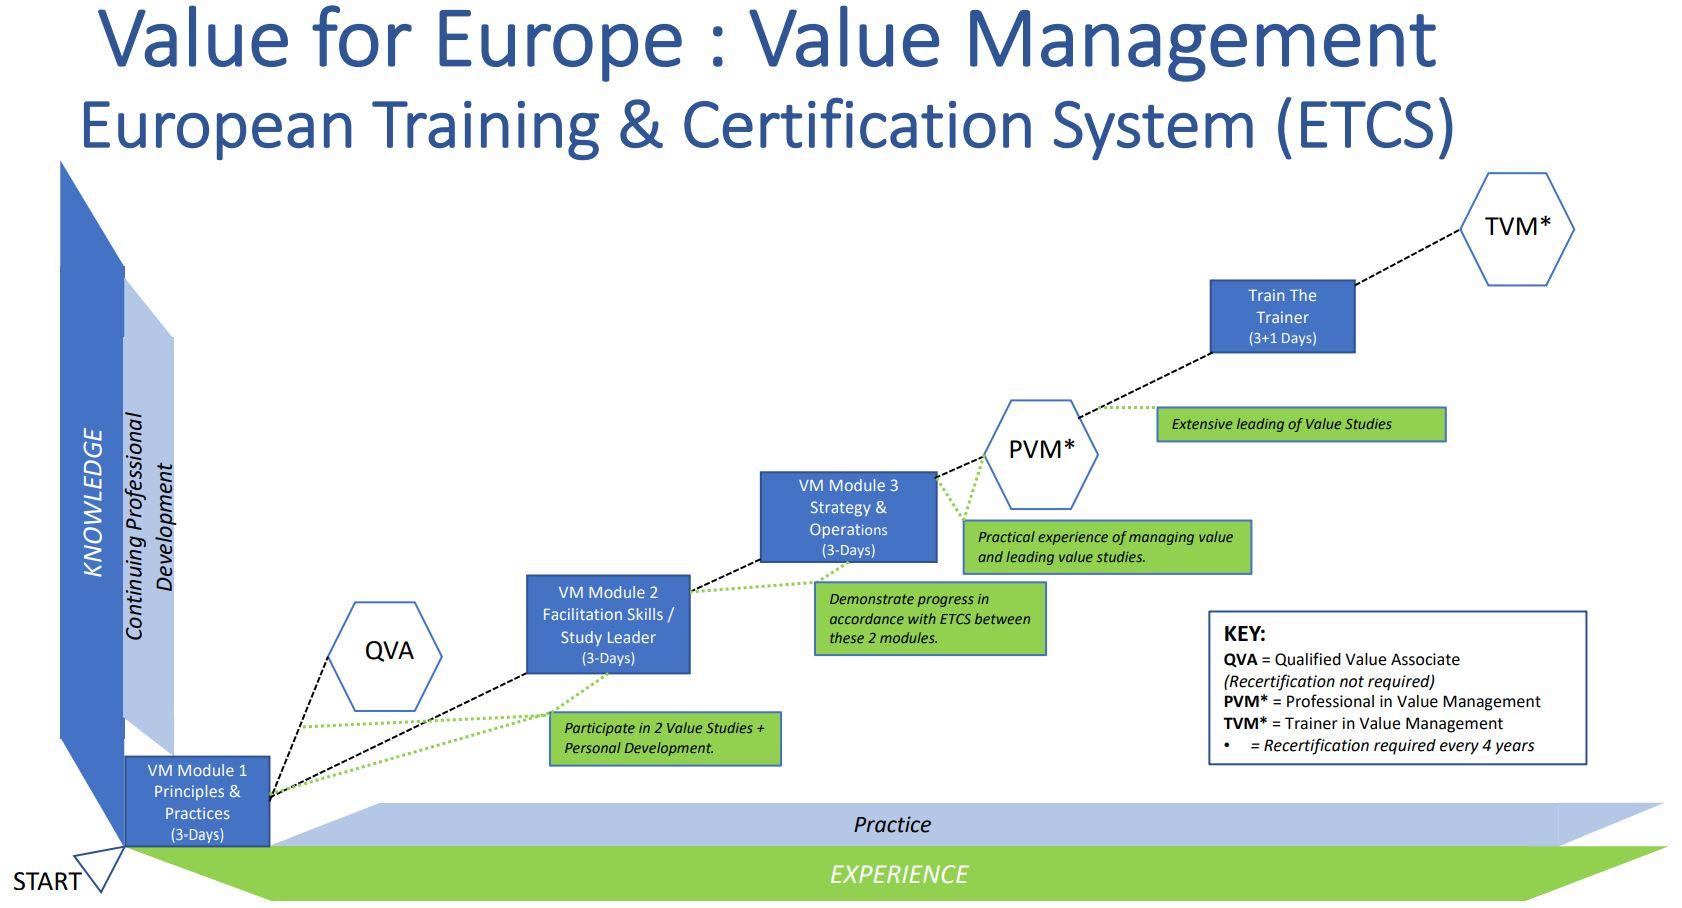 European Training & Certification System